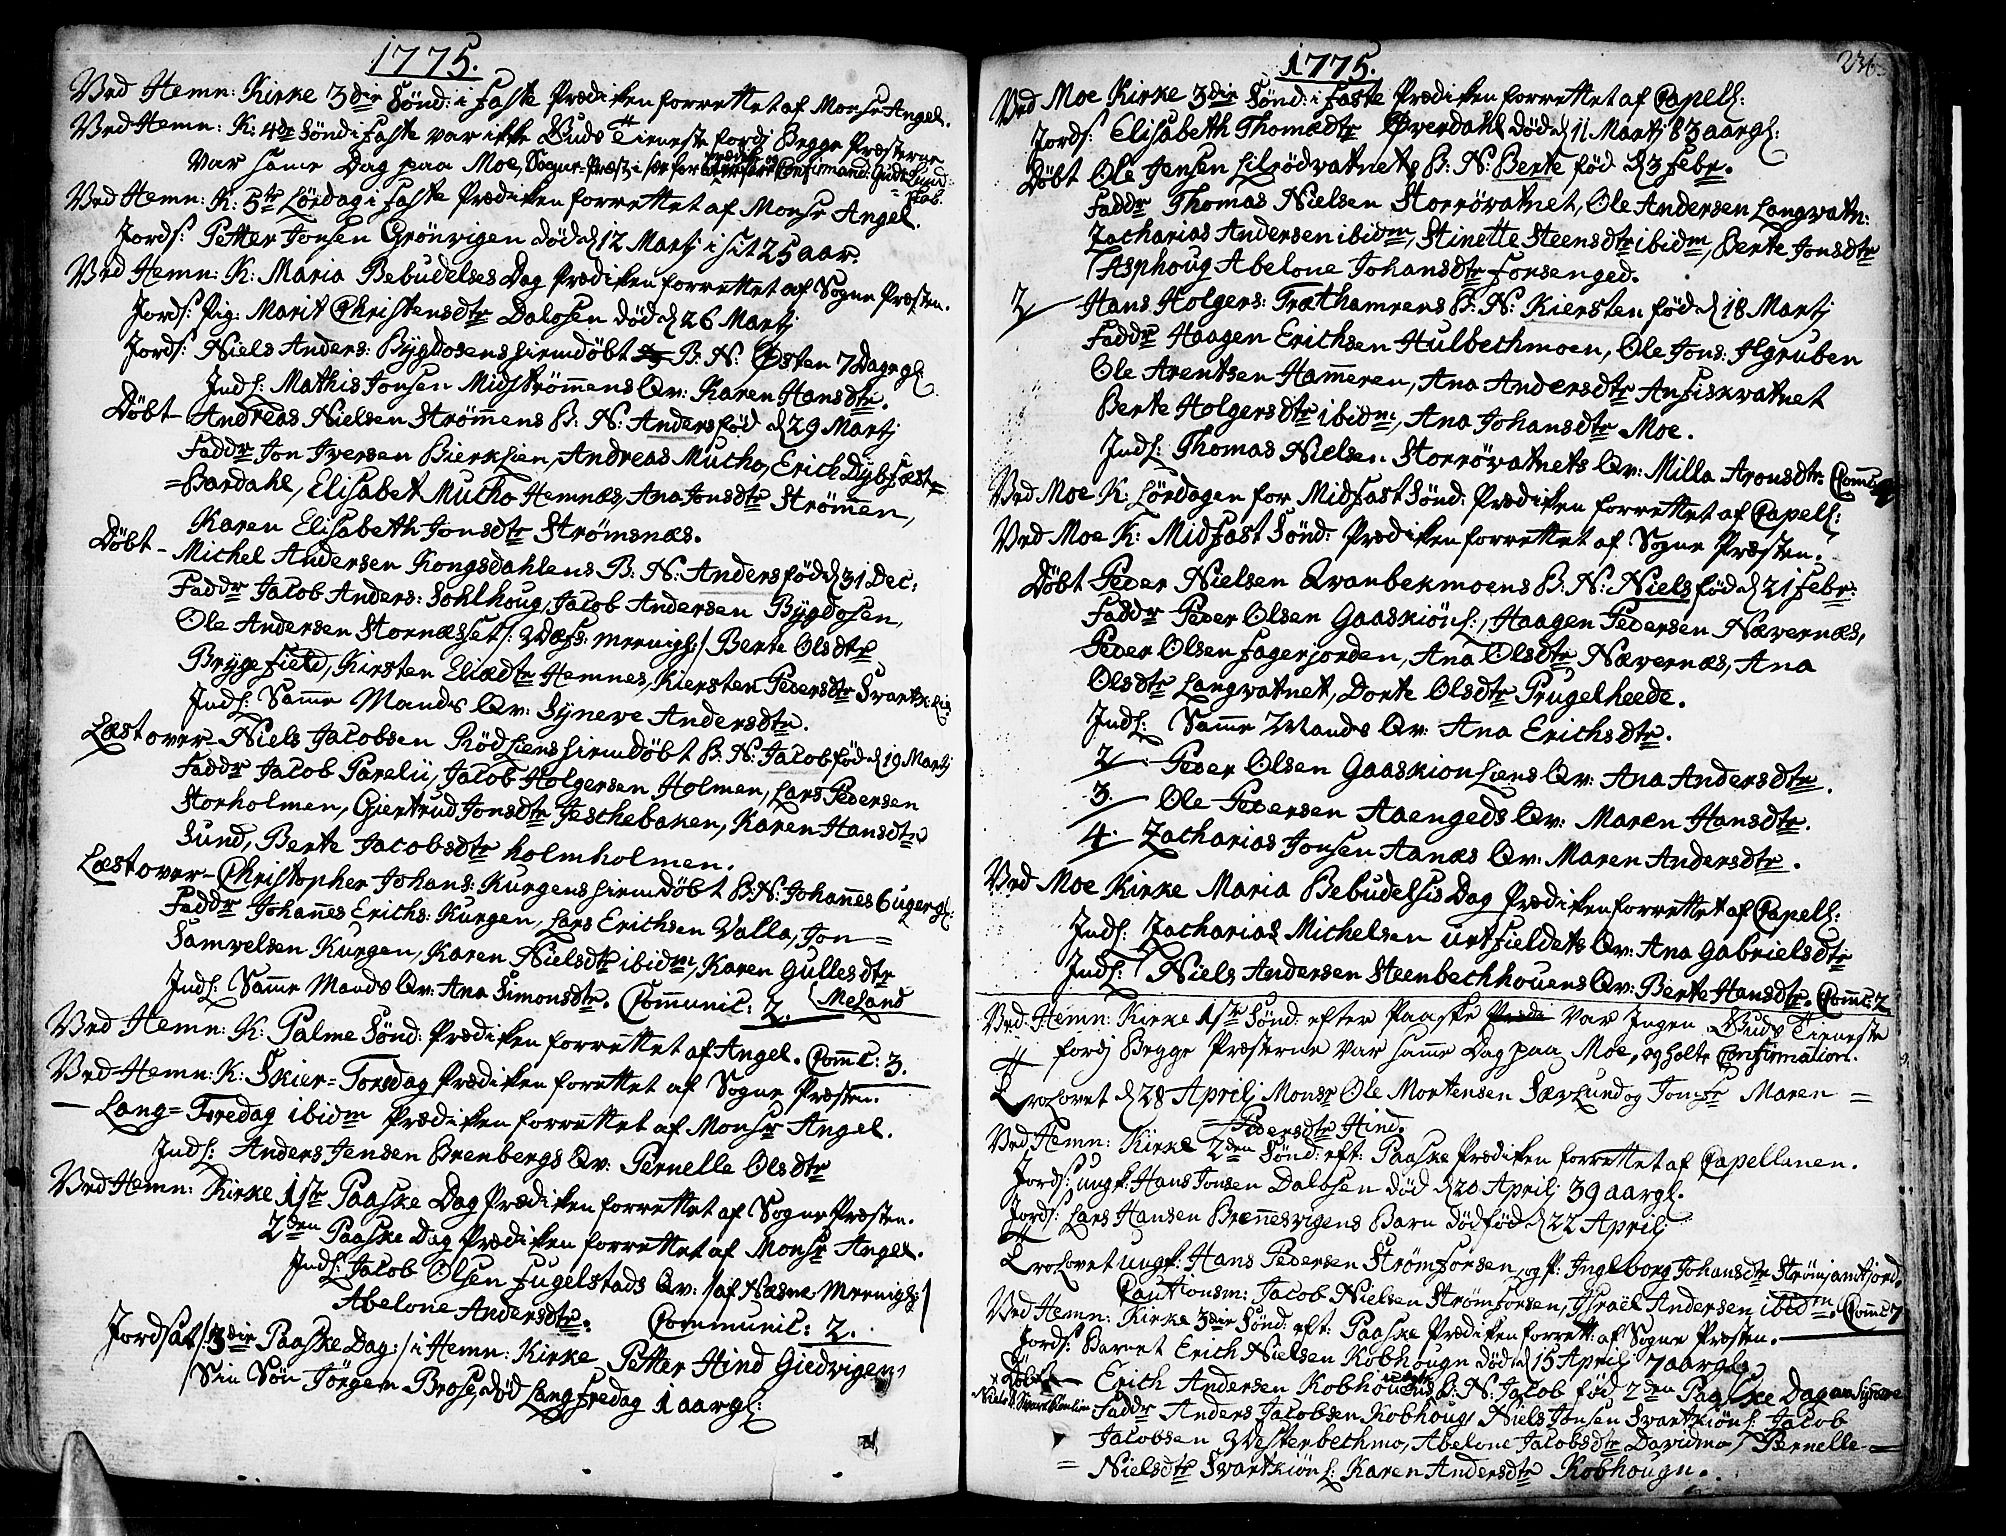 SAT, Ministerialprotokoller, klokkerbøker og fødselsregistre - Nordland, 825/L0348: Ministerialbok nr. 825A04, 1752-1788, s. 236